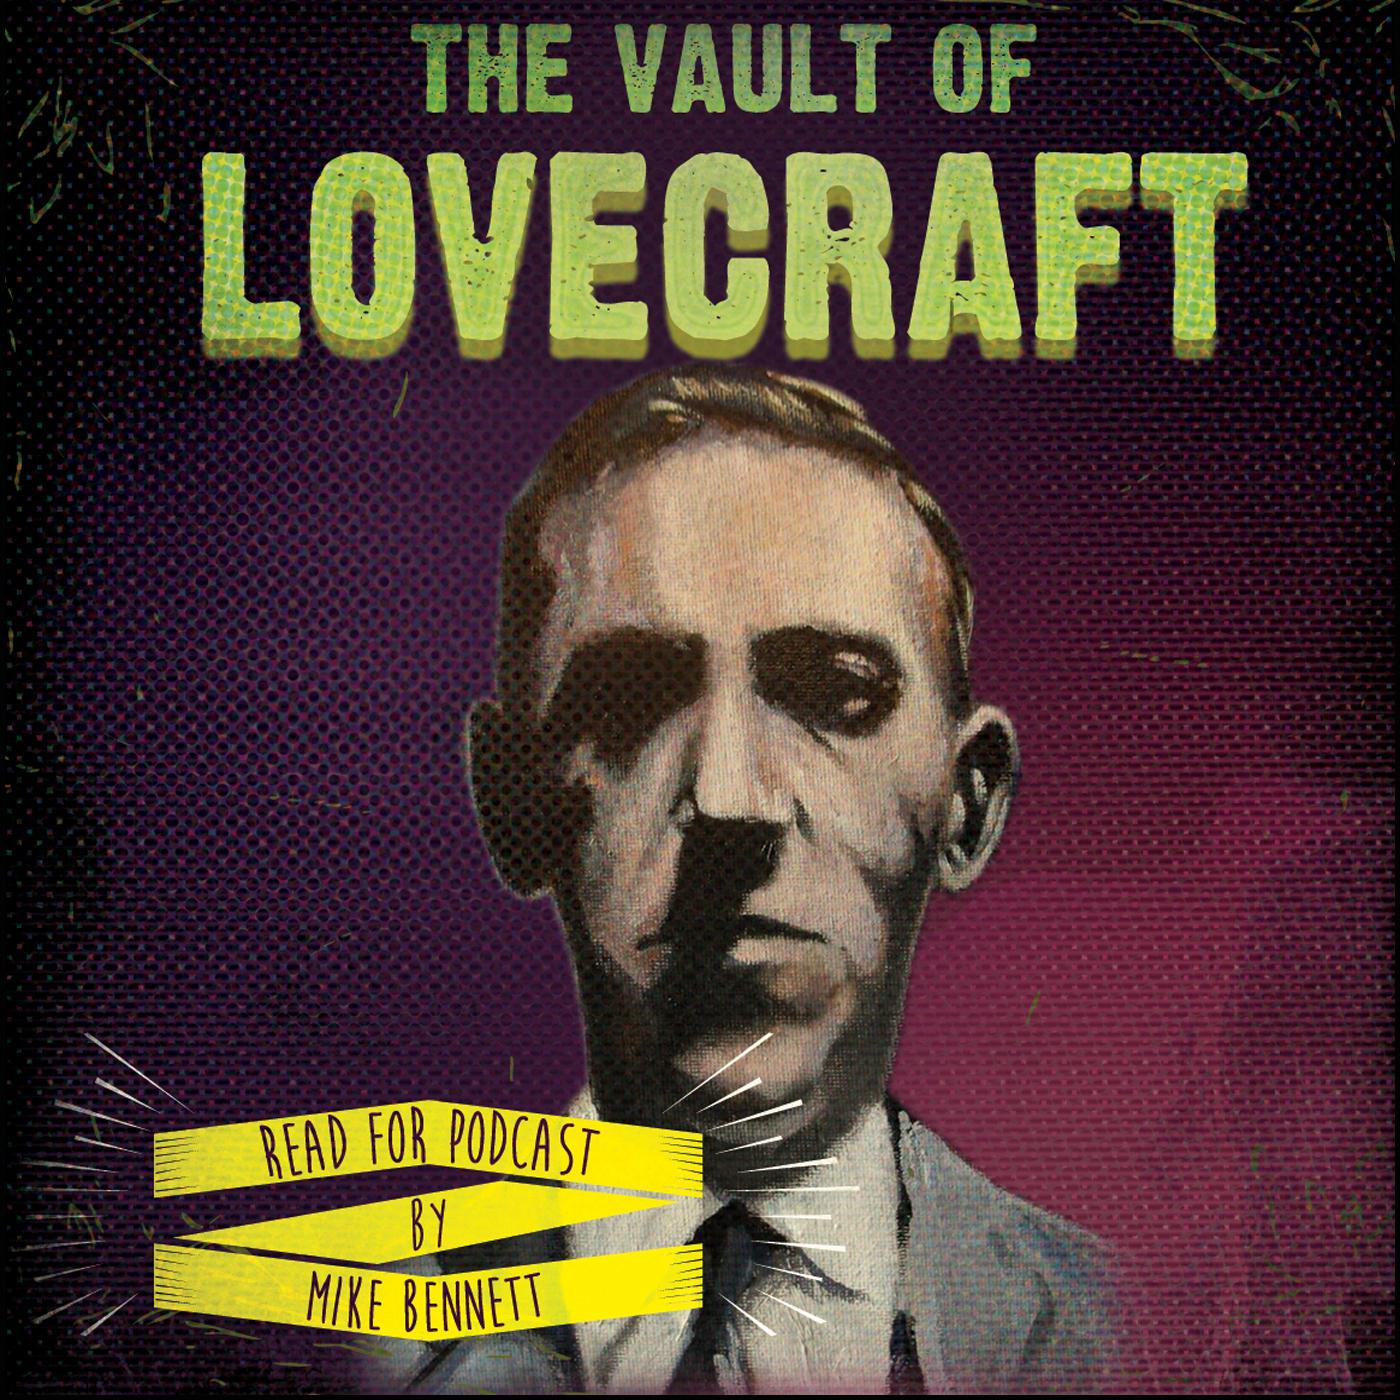 The Vault of Lovecraft